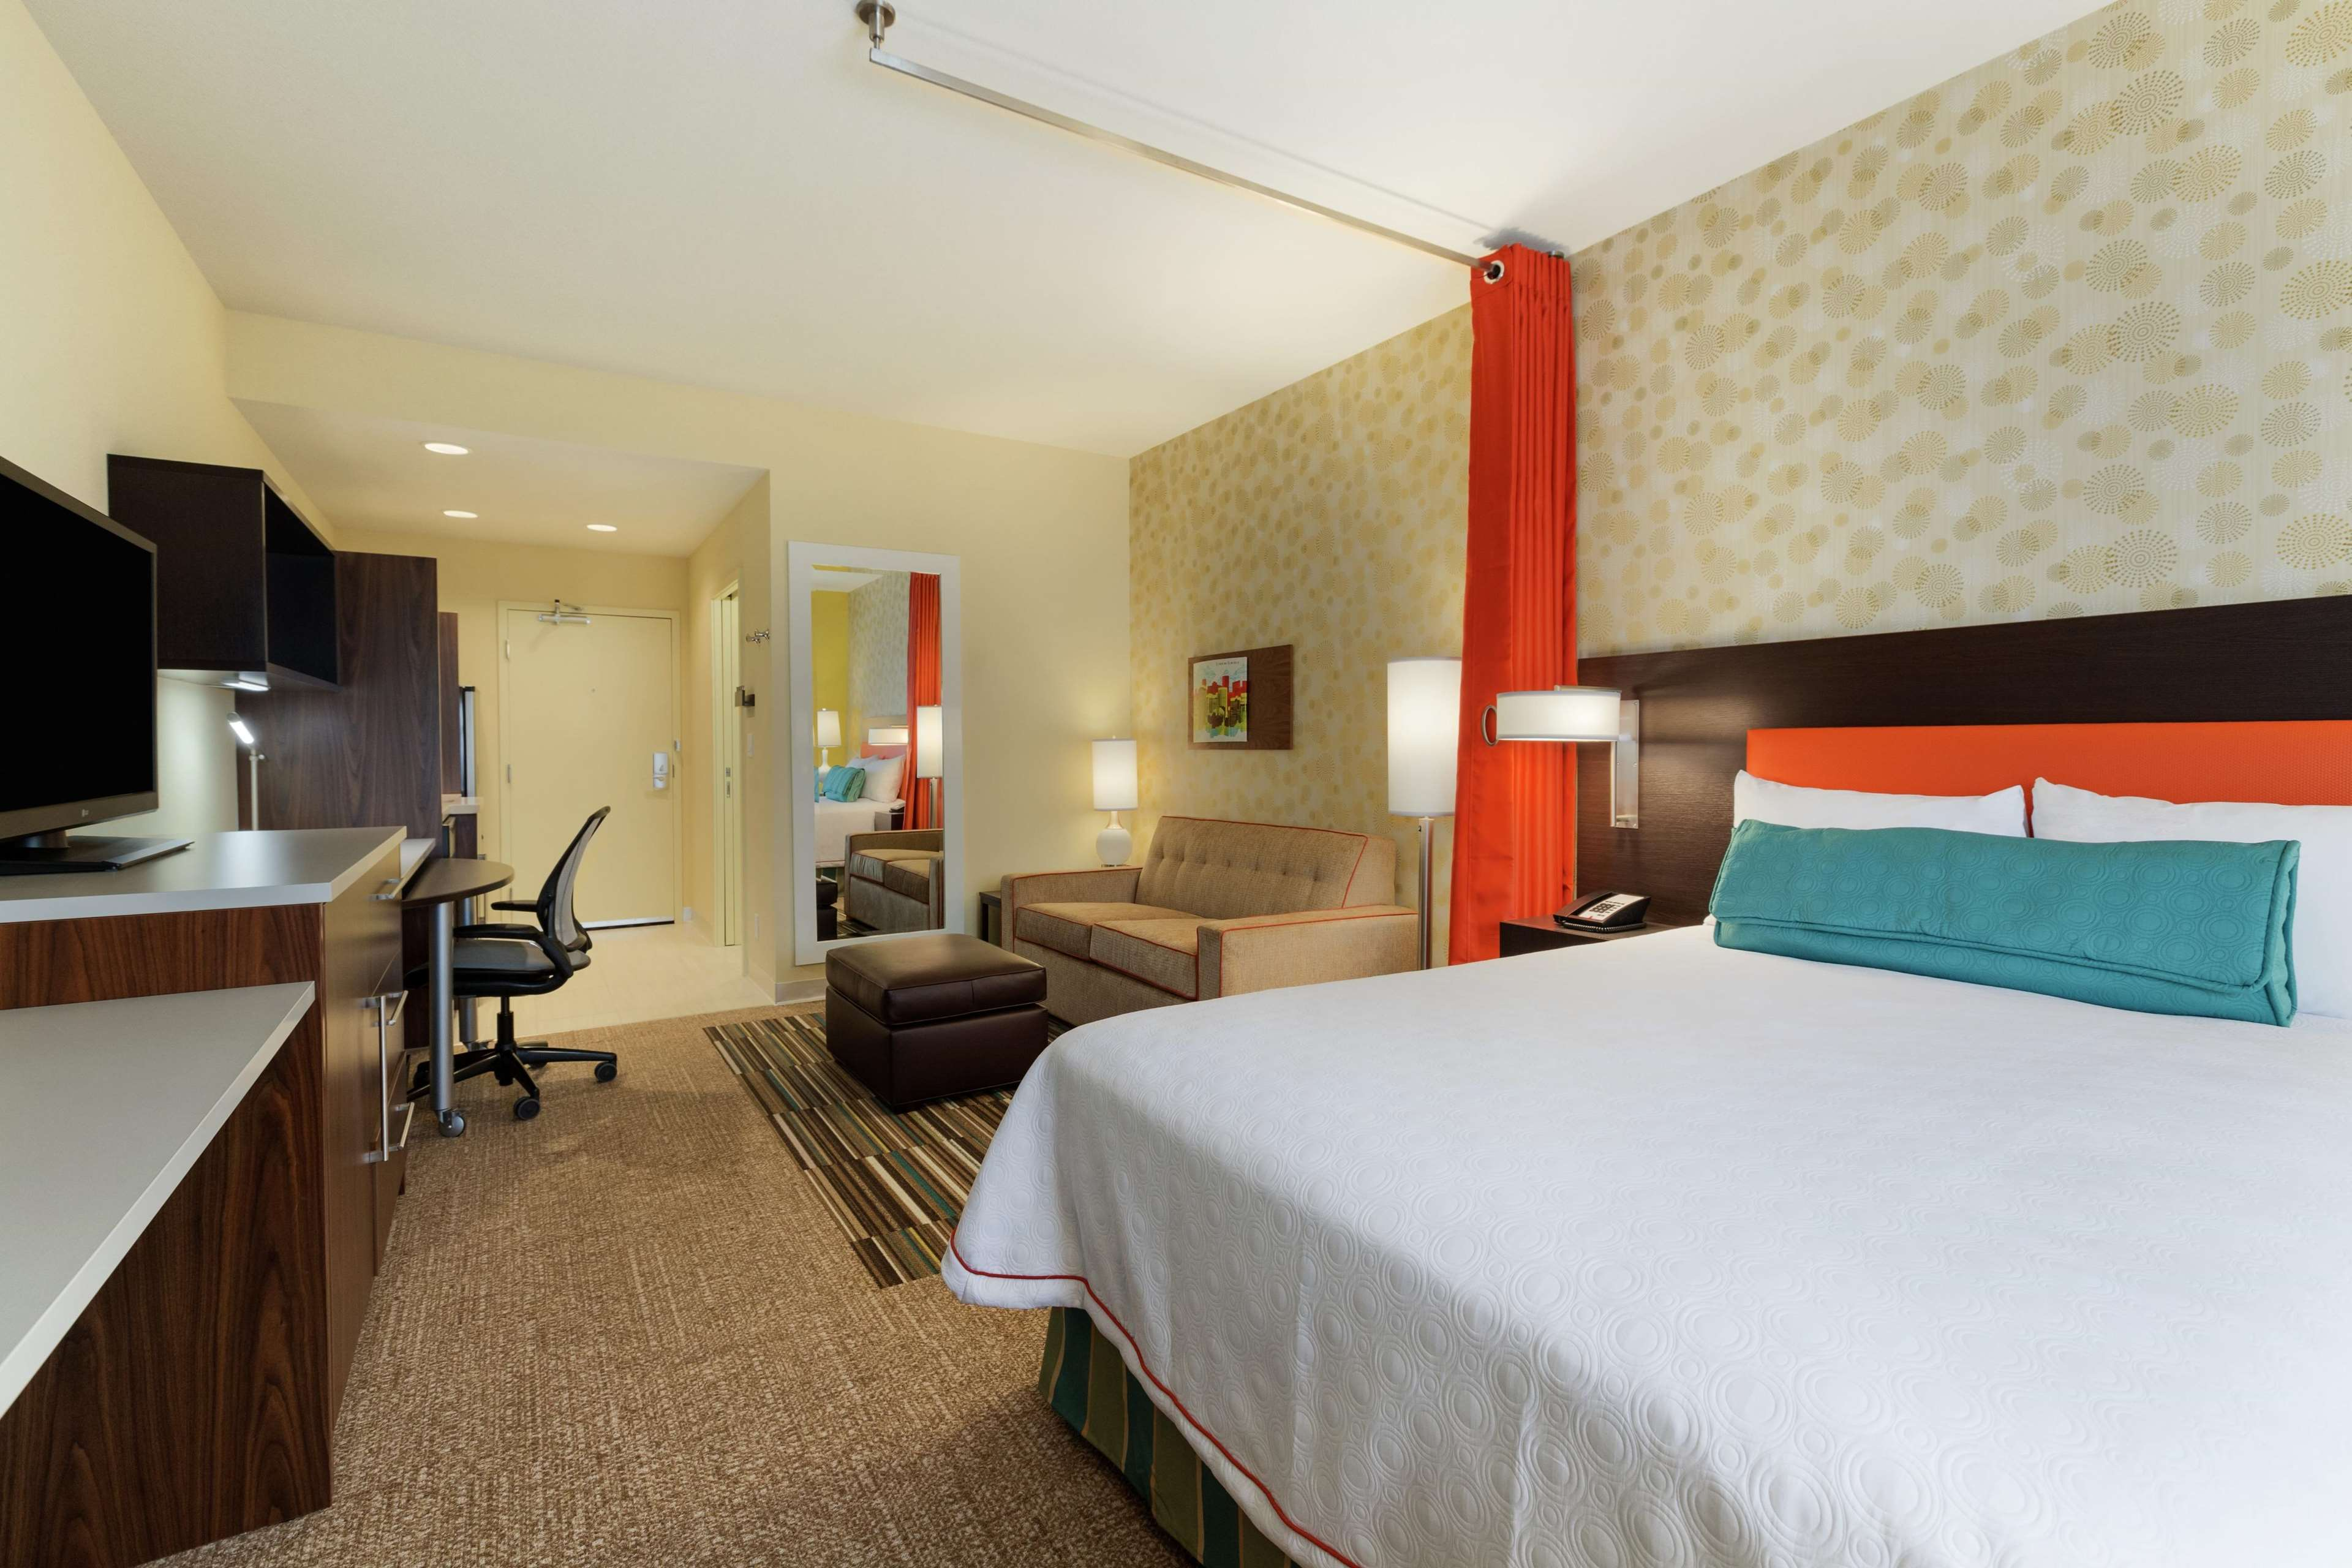 Home2 Suites by Hilton Azusa image 0